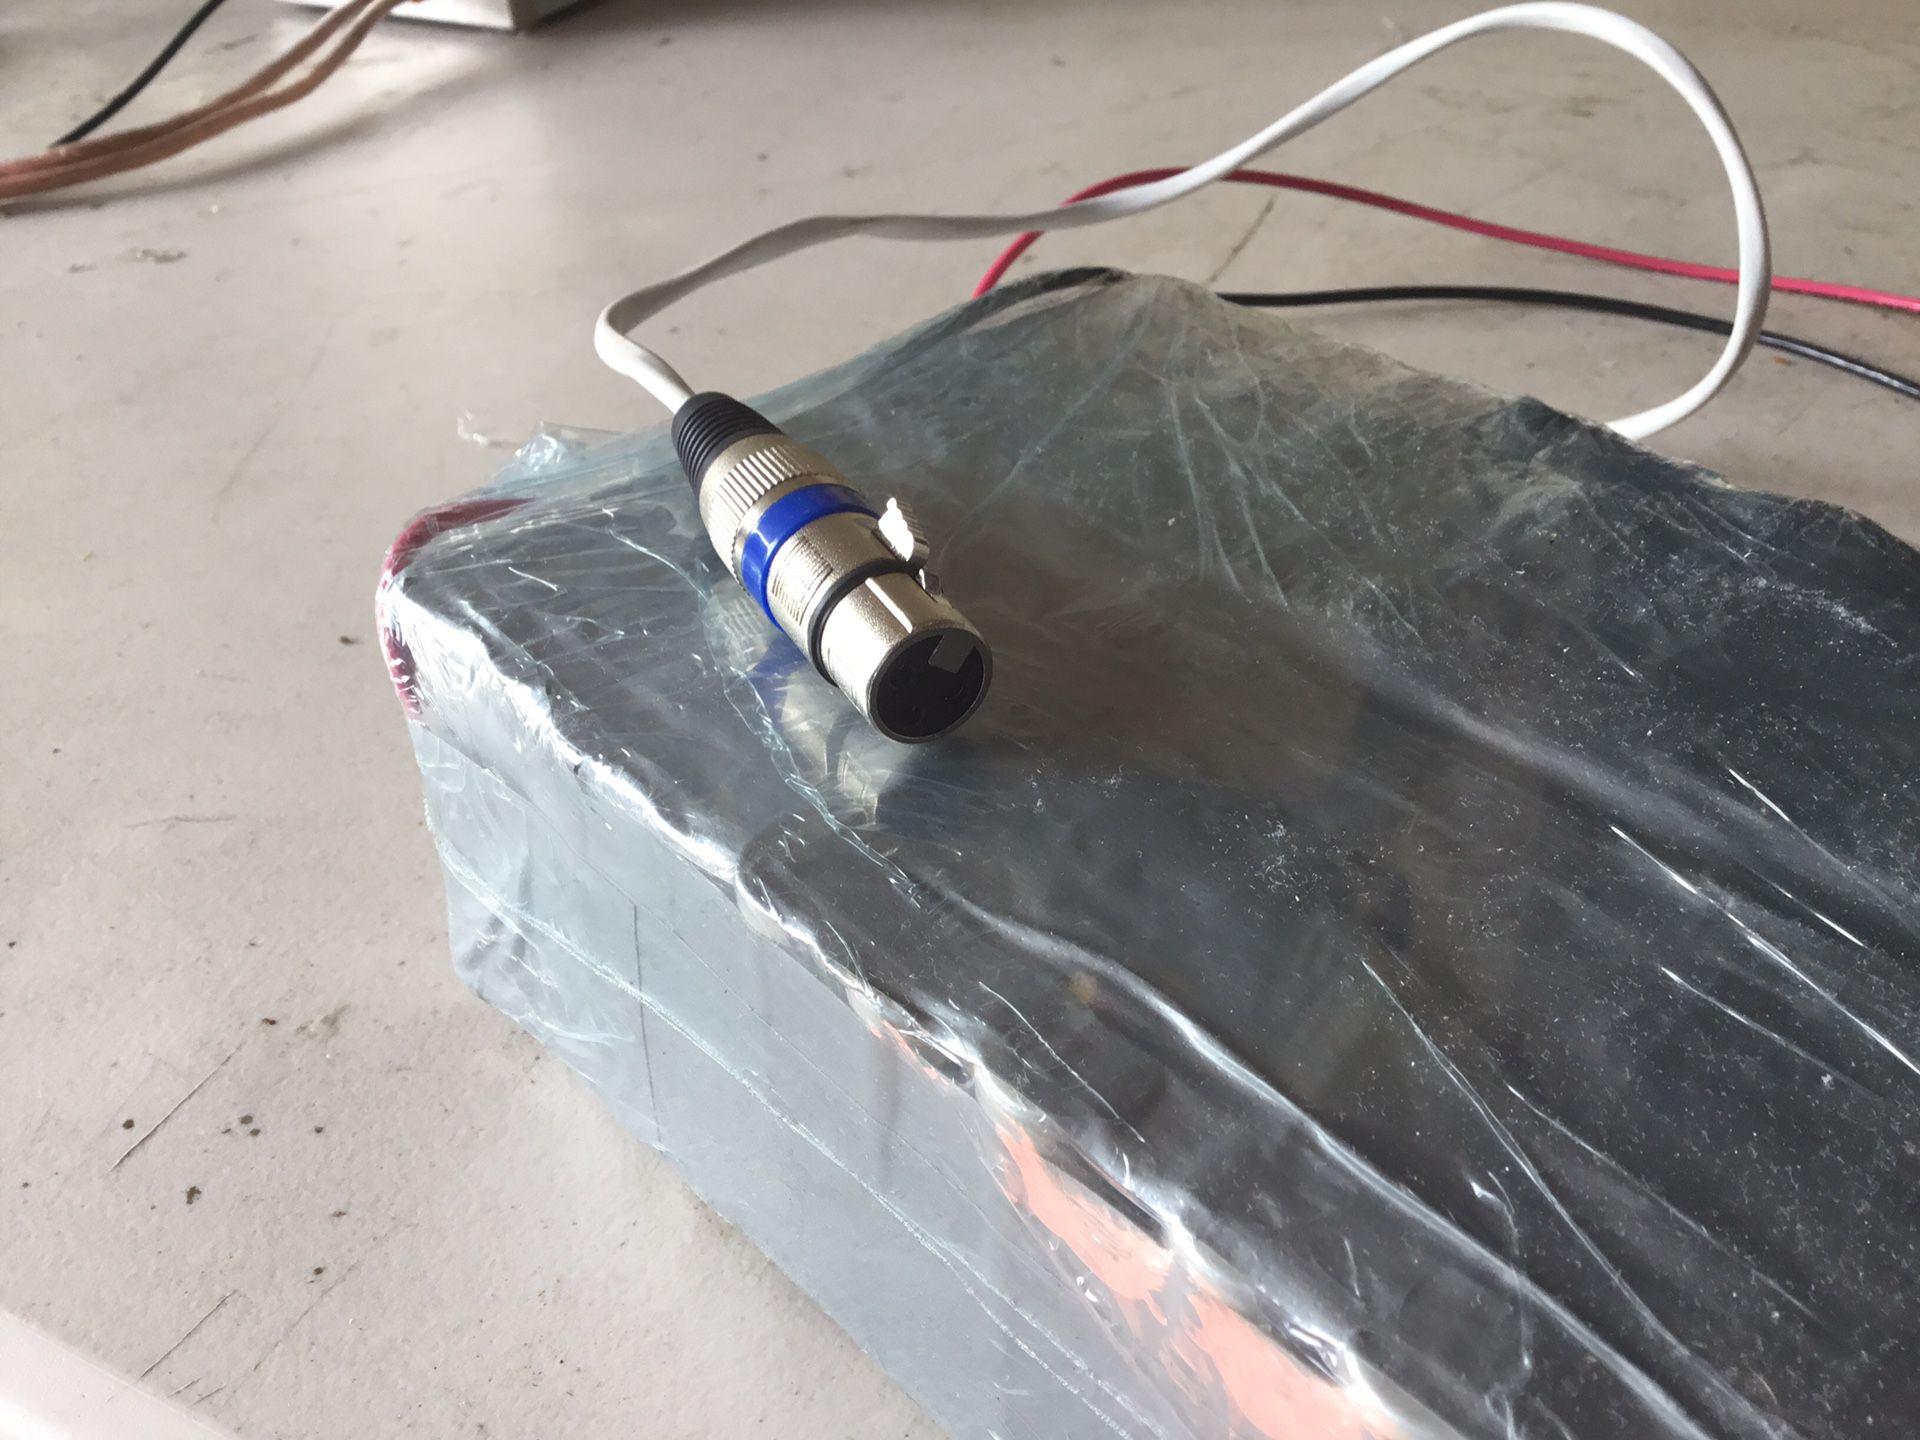 E-Bike Replacement Battery 48v or 36v